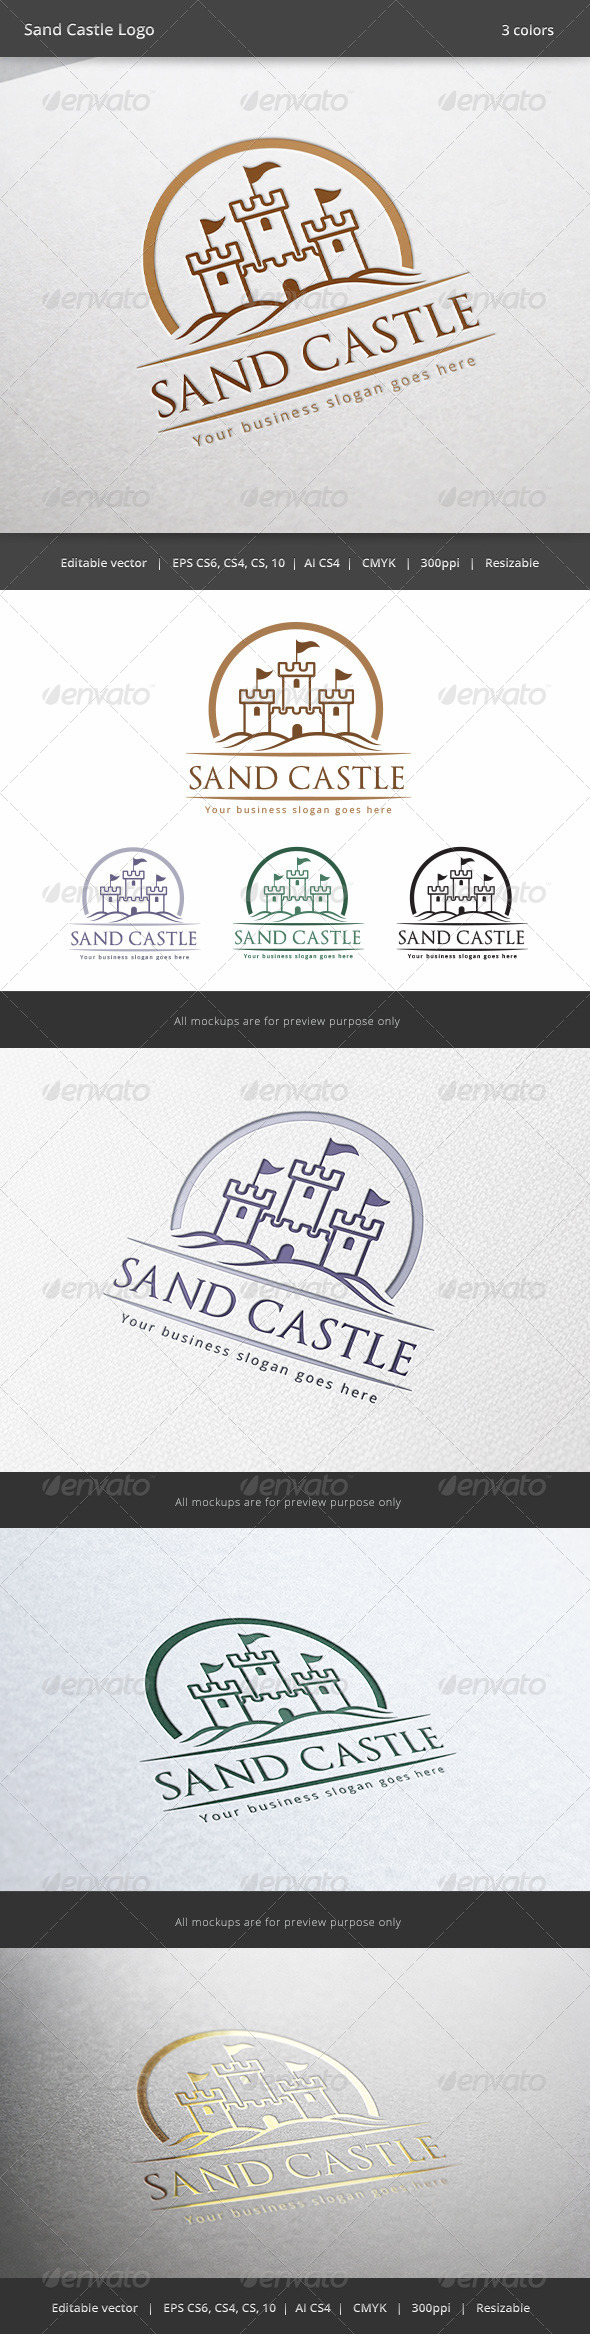 Sand Castle Logo - Buildings Logo Templates